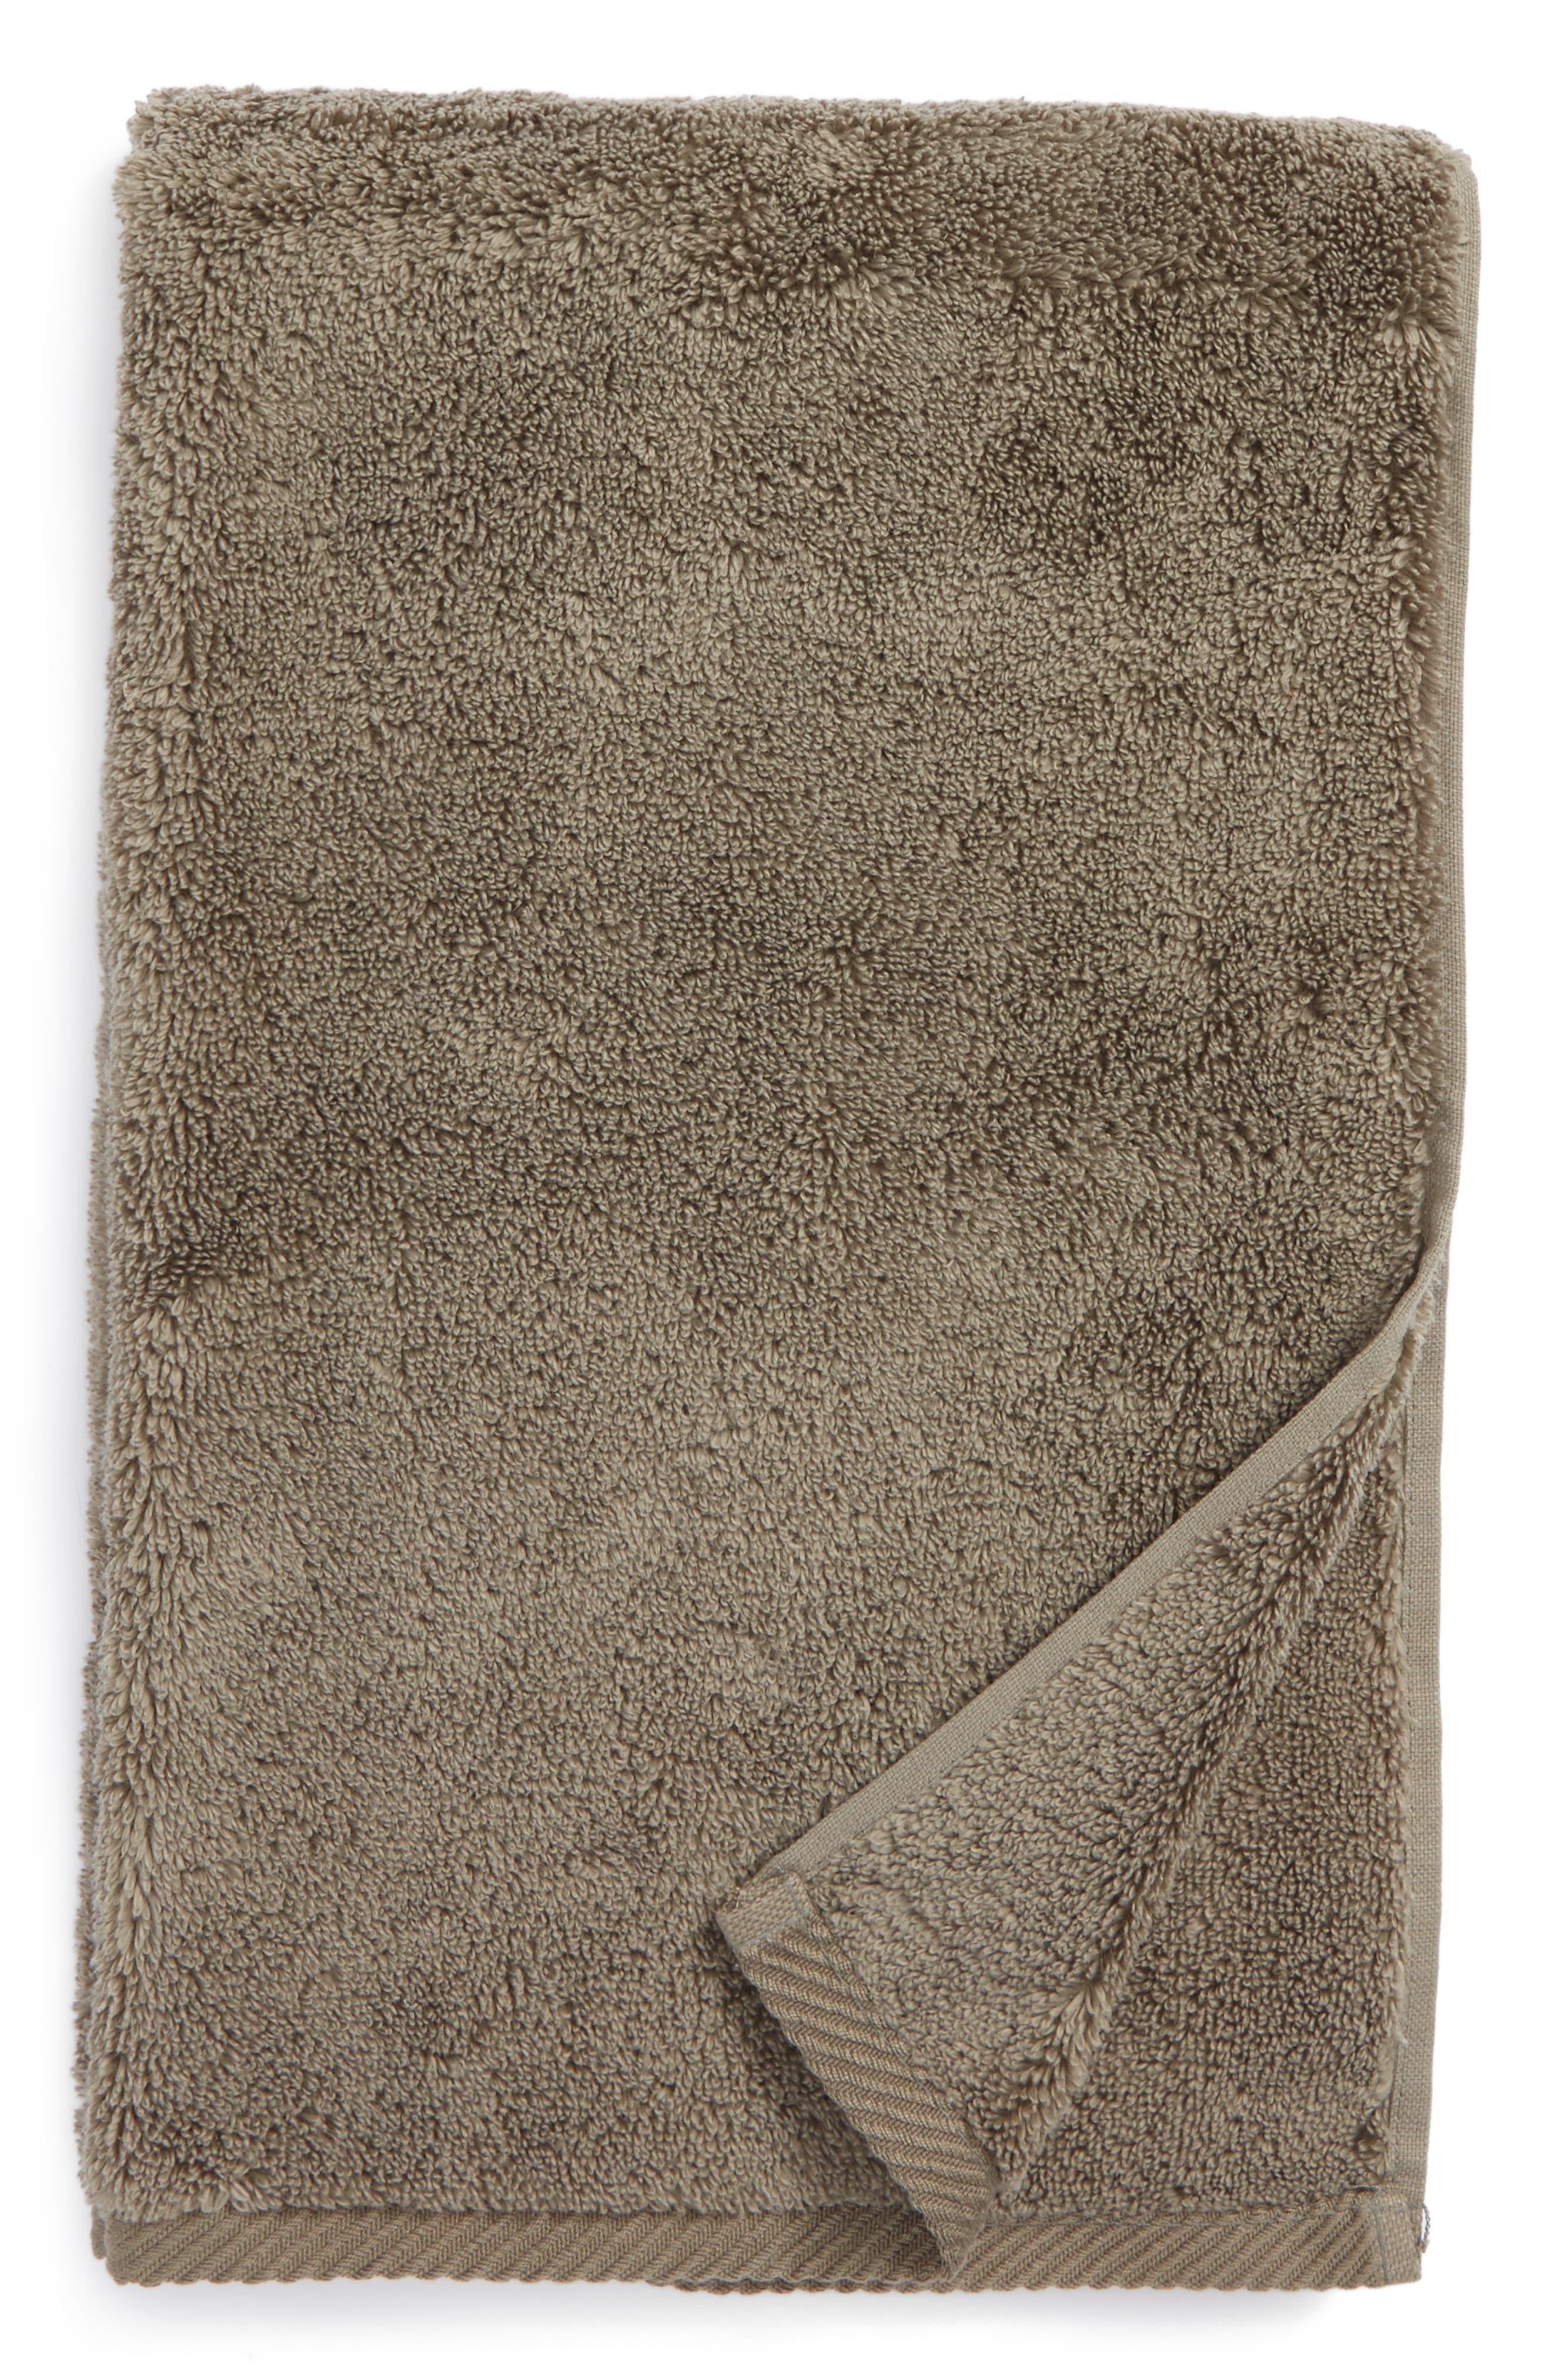 Main Image - Matouk Milagro Hand Towel